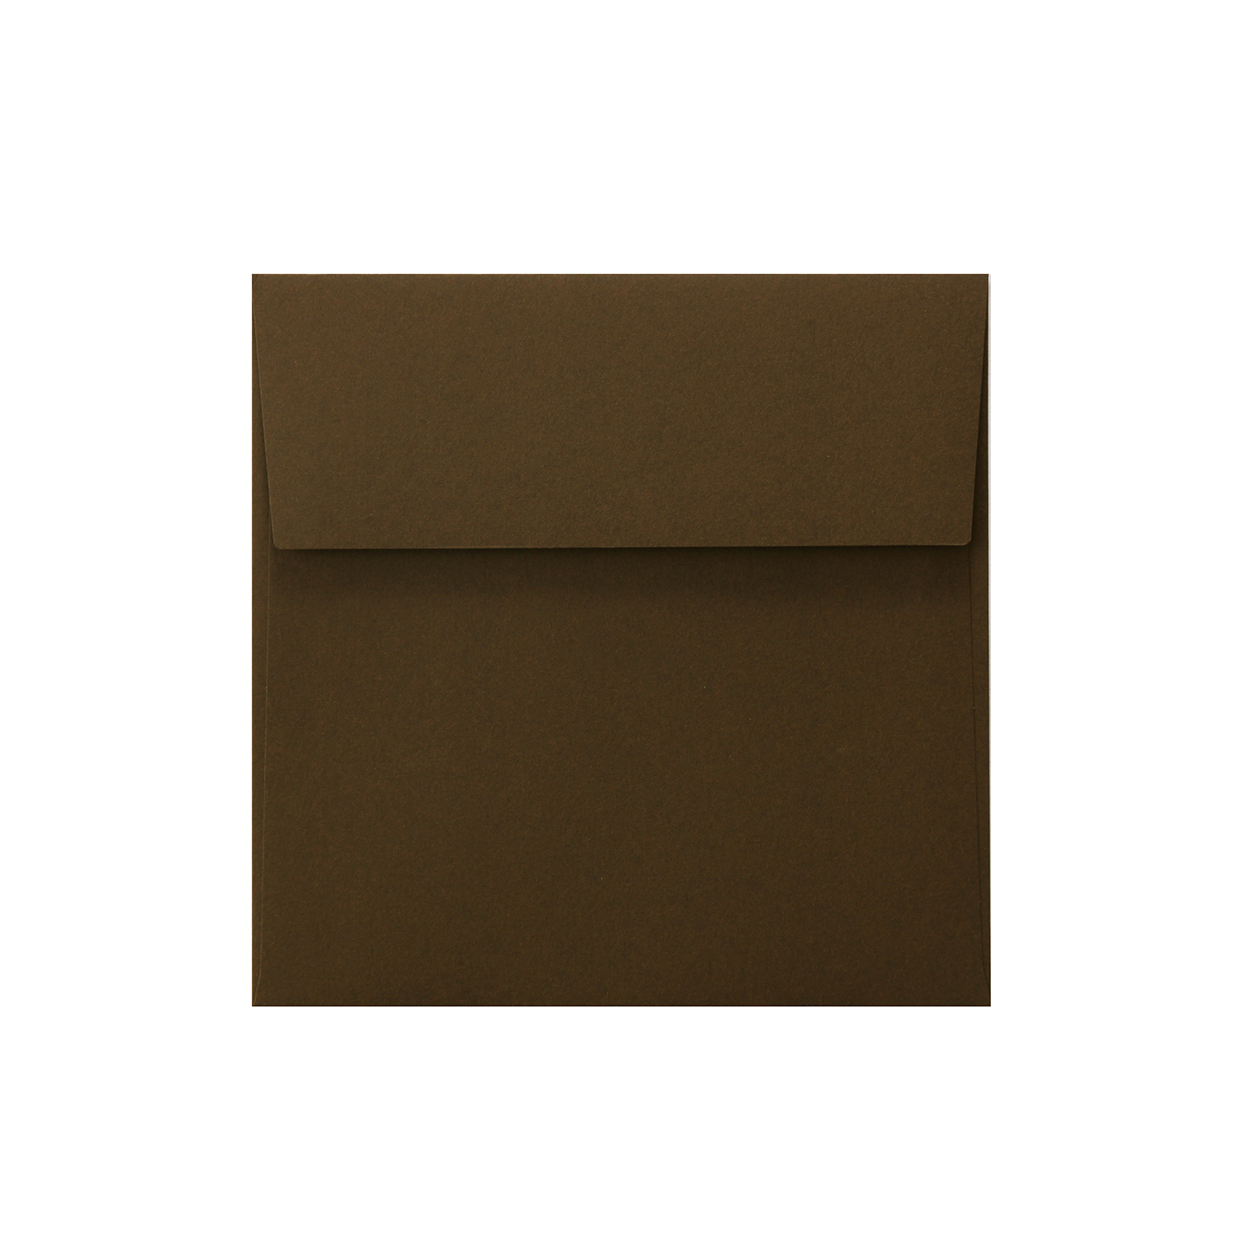 SE16カマス封筒 コットン チョコレート 116.3g